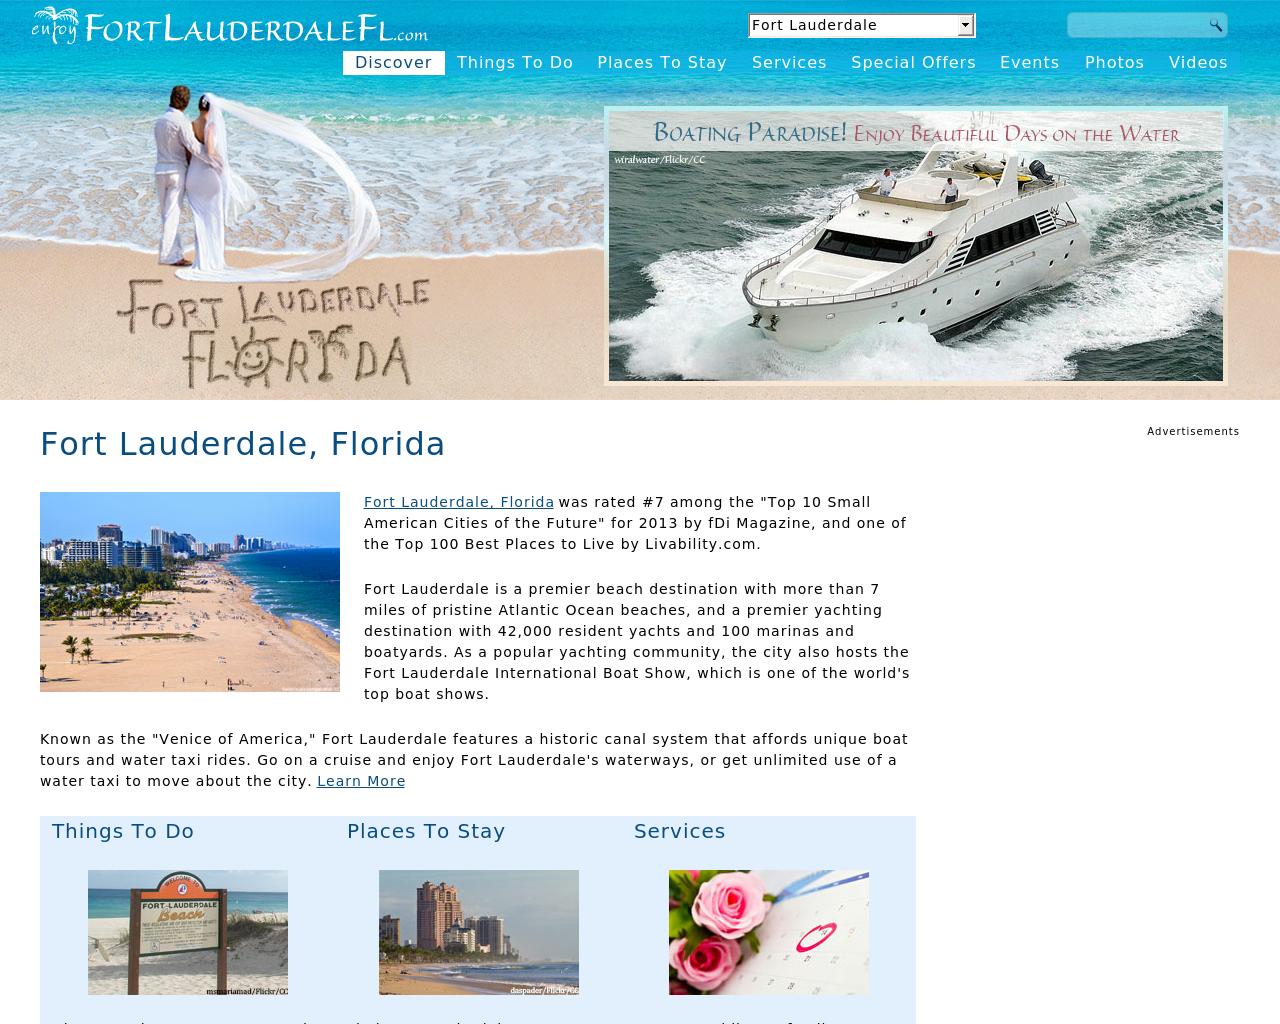 enjoyFortLauderdaleFL.com-Advertising-Reviews-Pricing